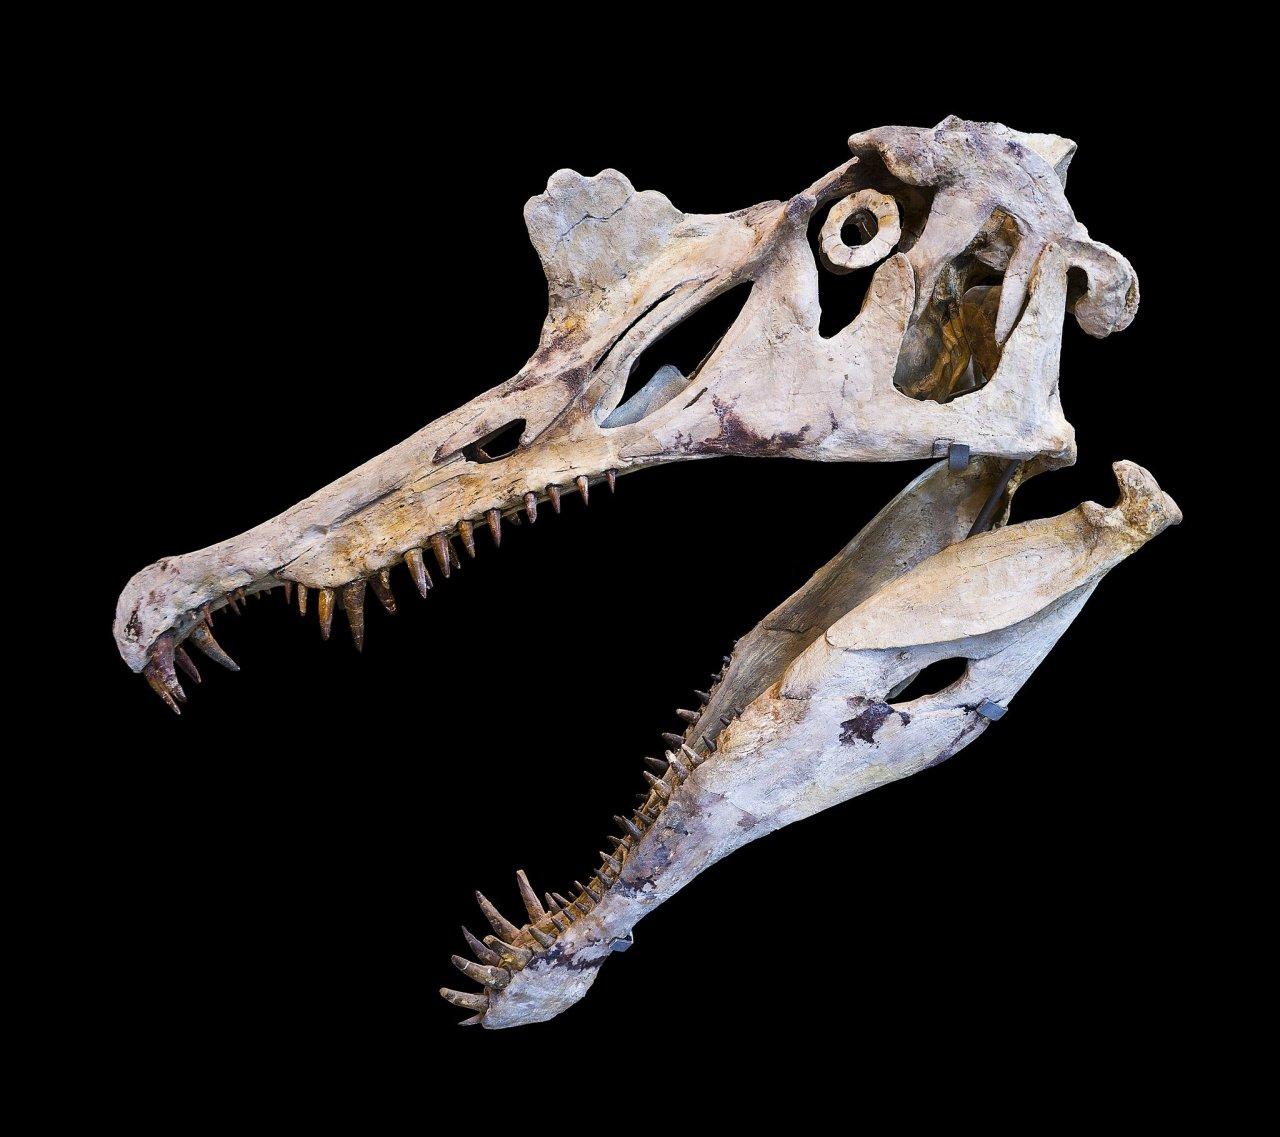 2048px-Spinosaurus_Crane-26y9z9jk8j.jpg